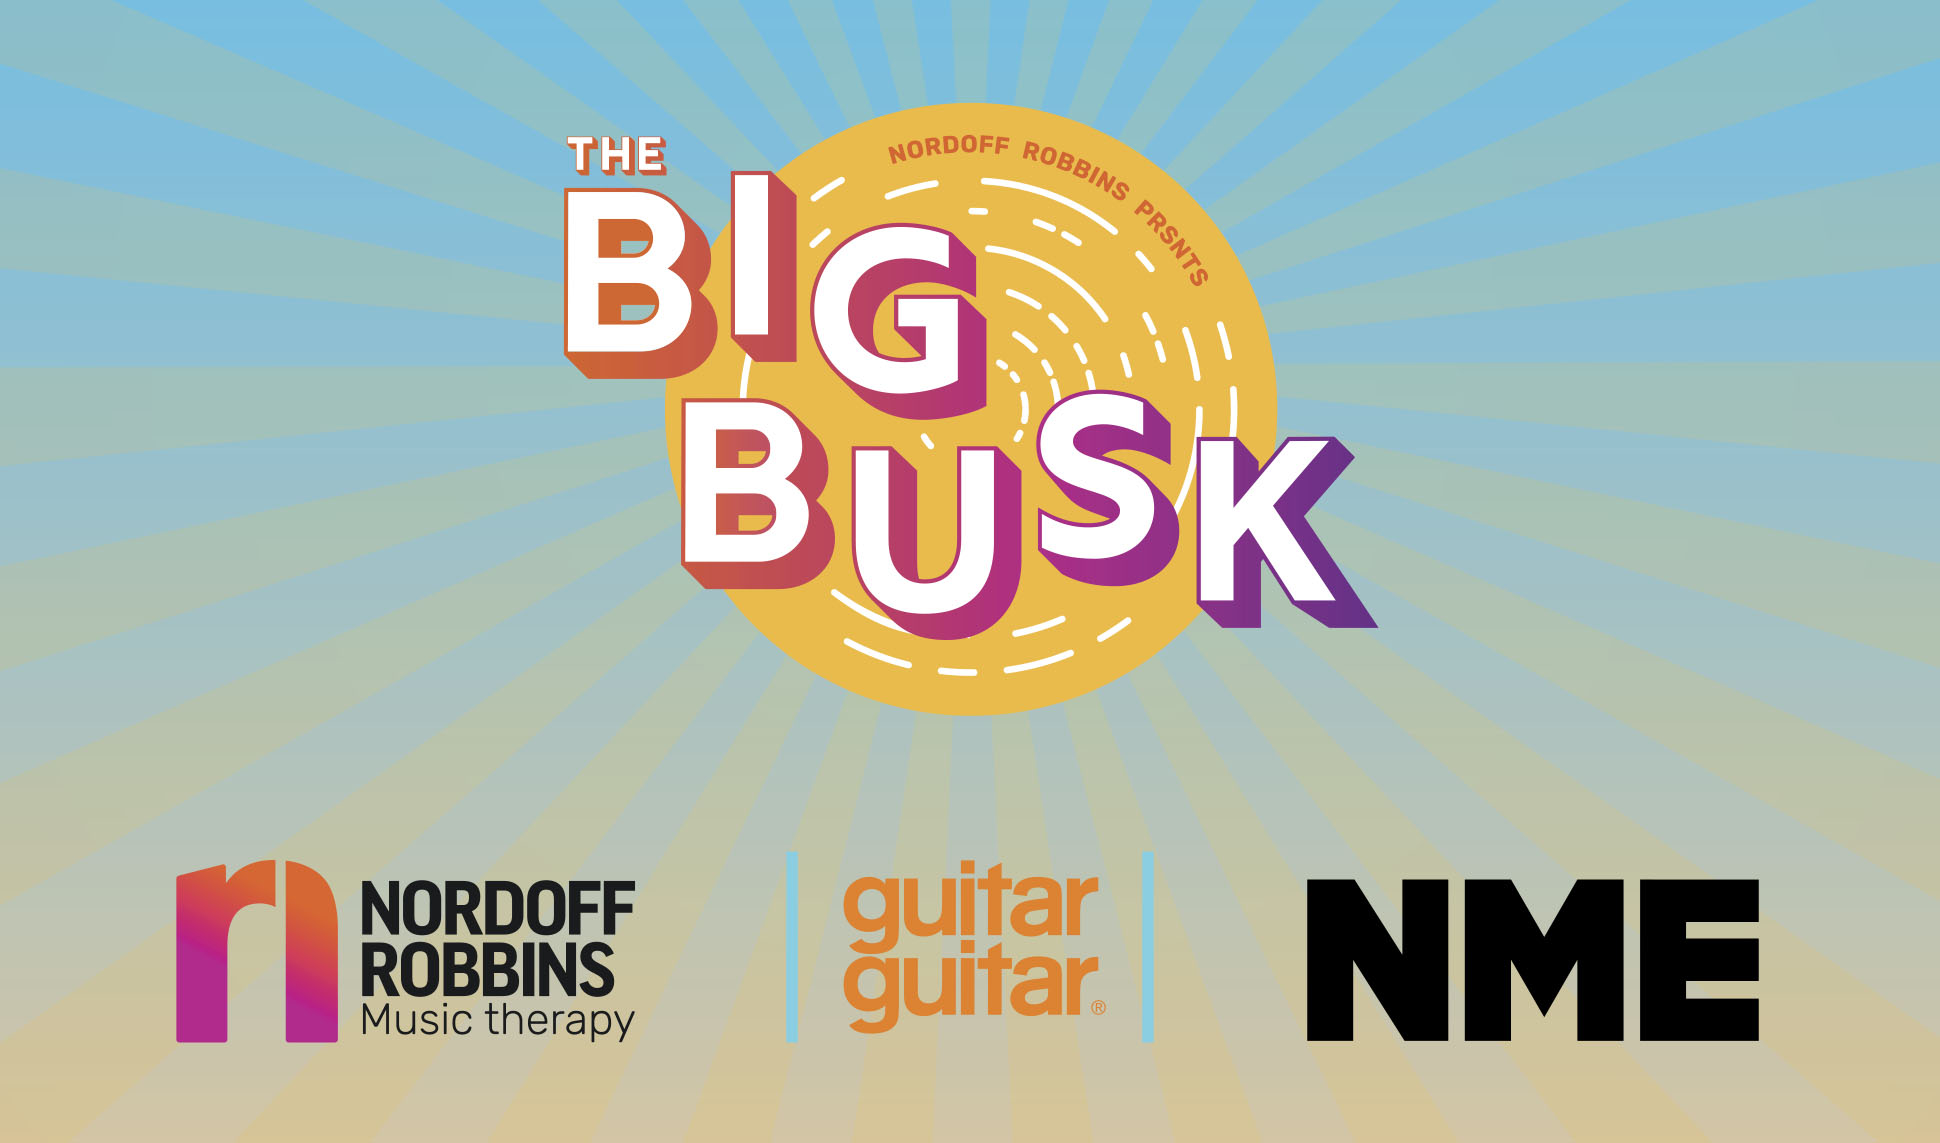 The Big Busk main branding. A logo and Nordoff Robbins logo, NME logo and Guitar Guitar logo